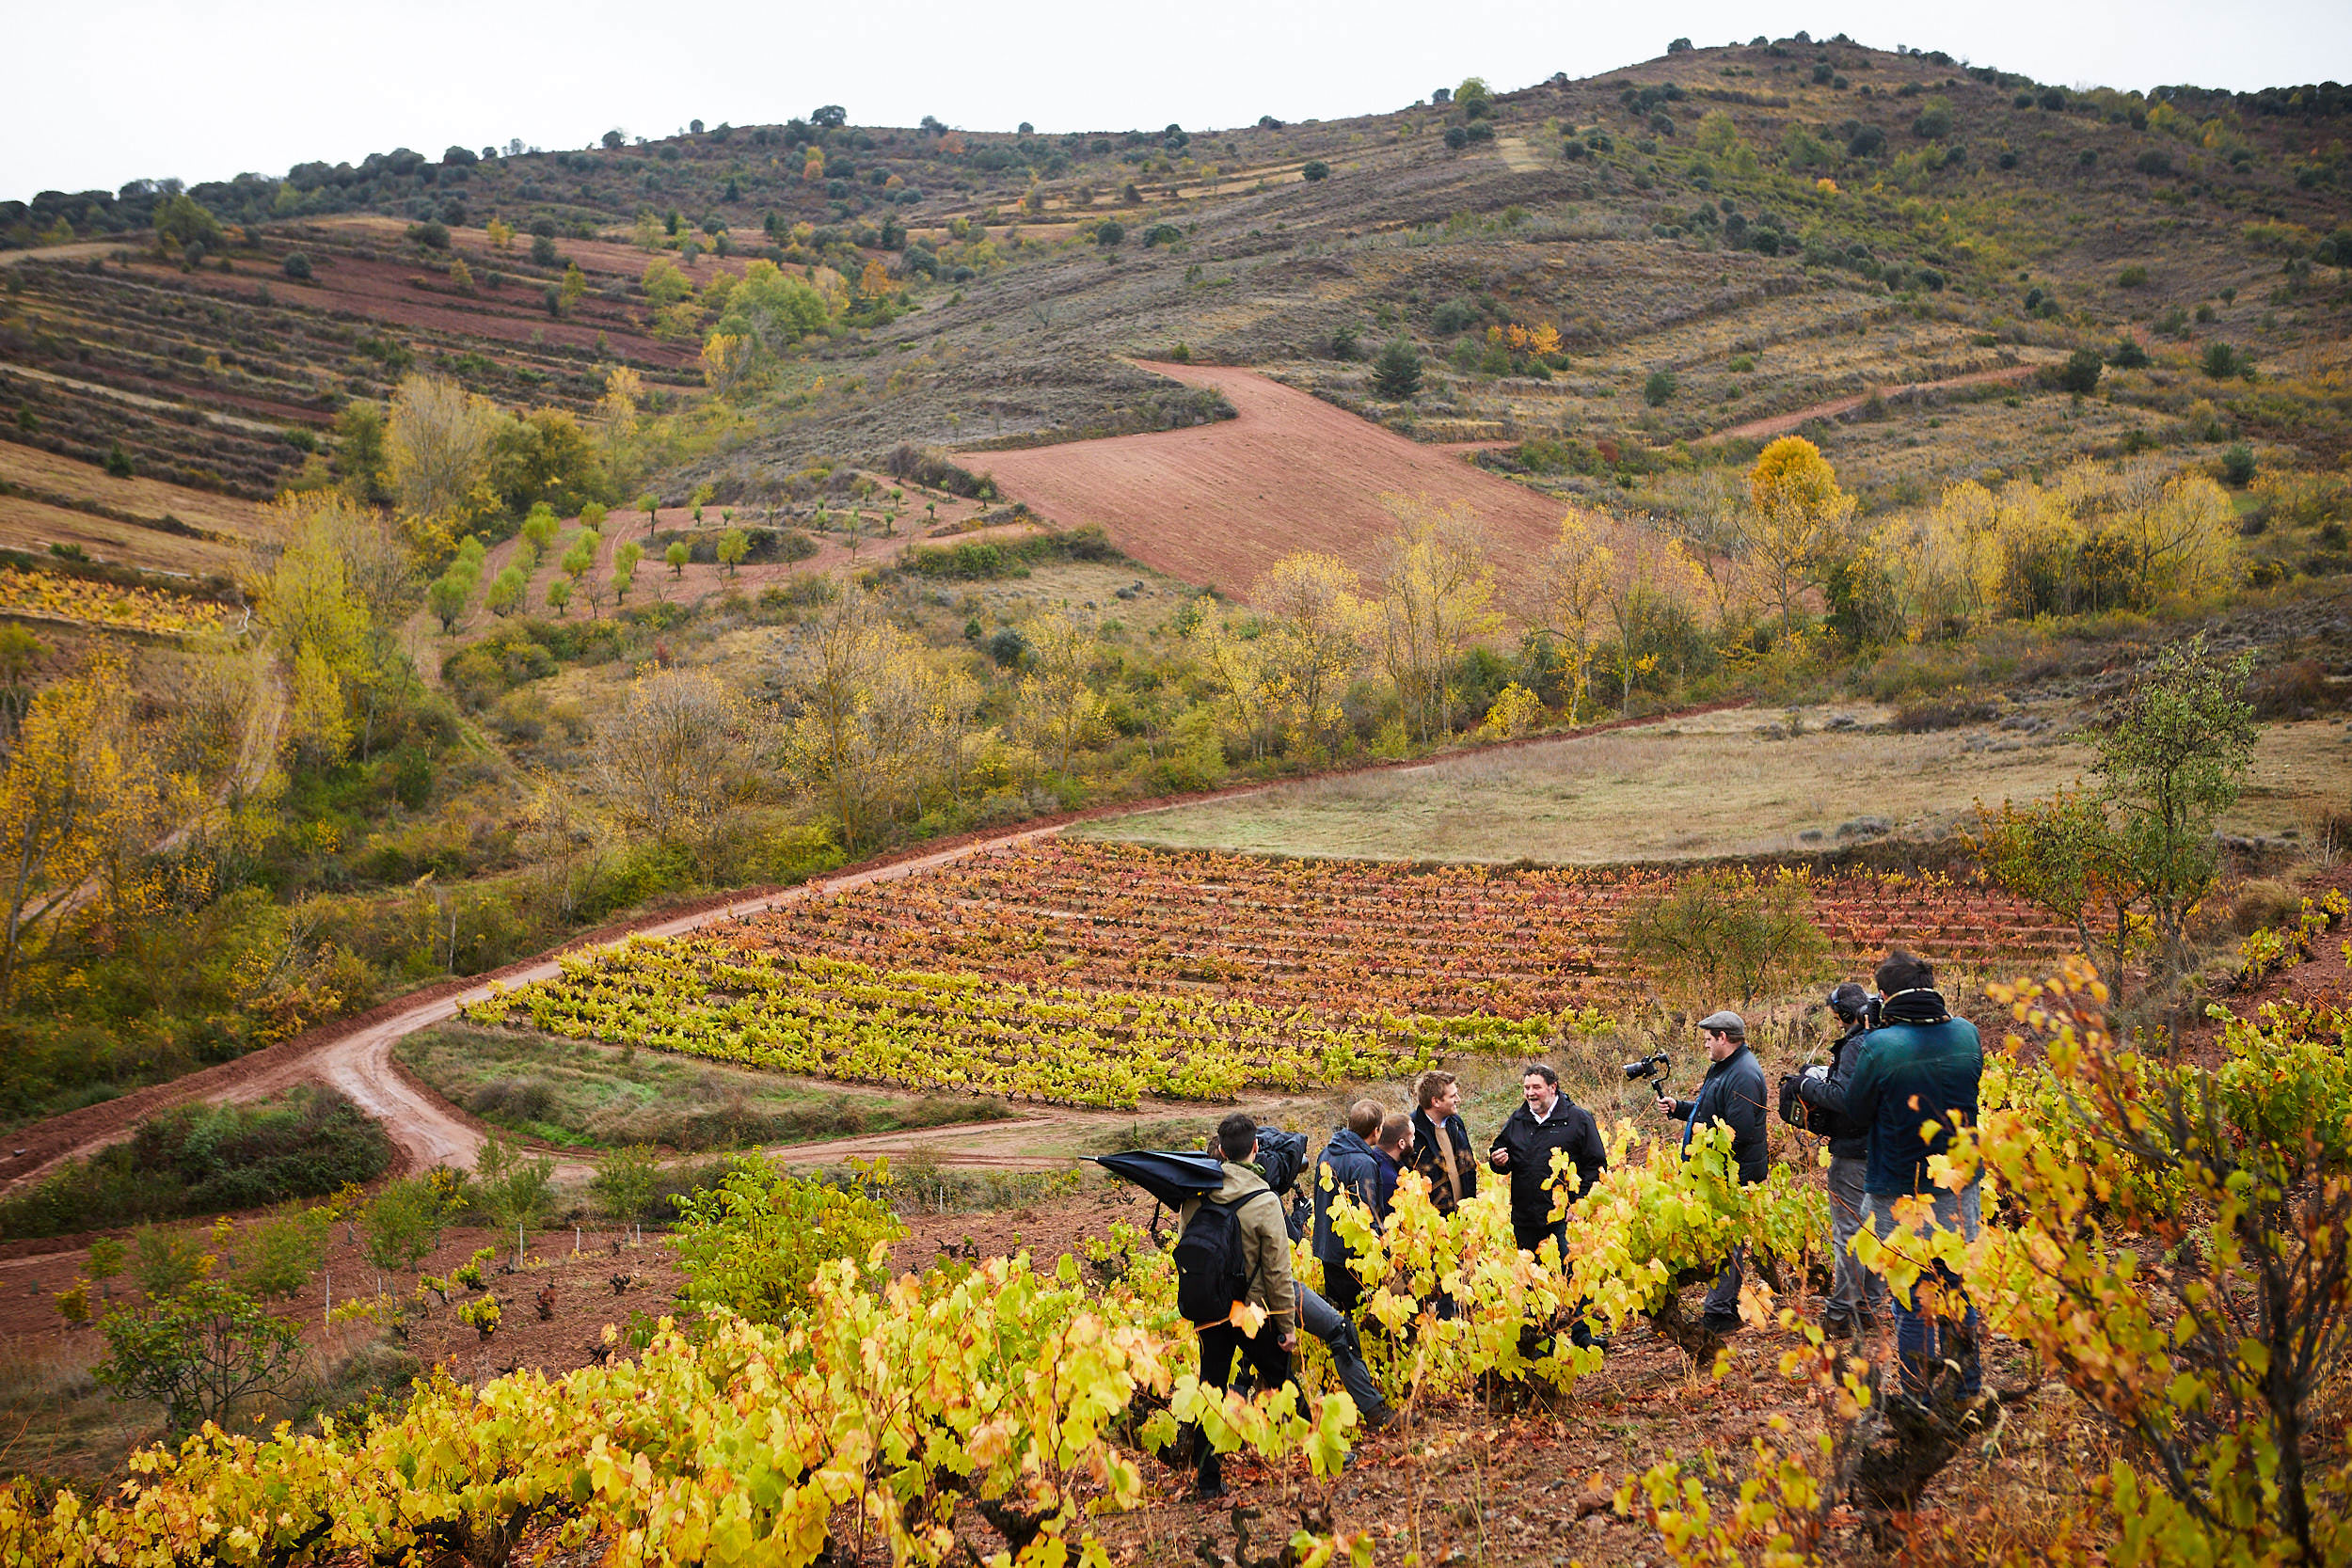 1711Commercial-professional-wine-photography-la-rioja-spain-James-Sturcke_0003.jpg